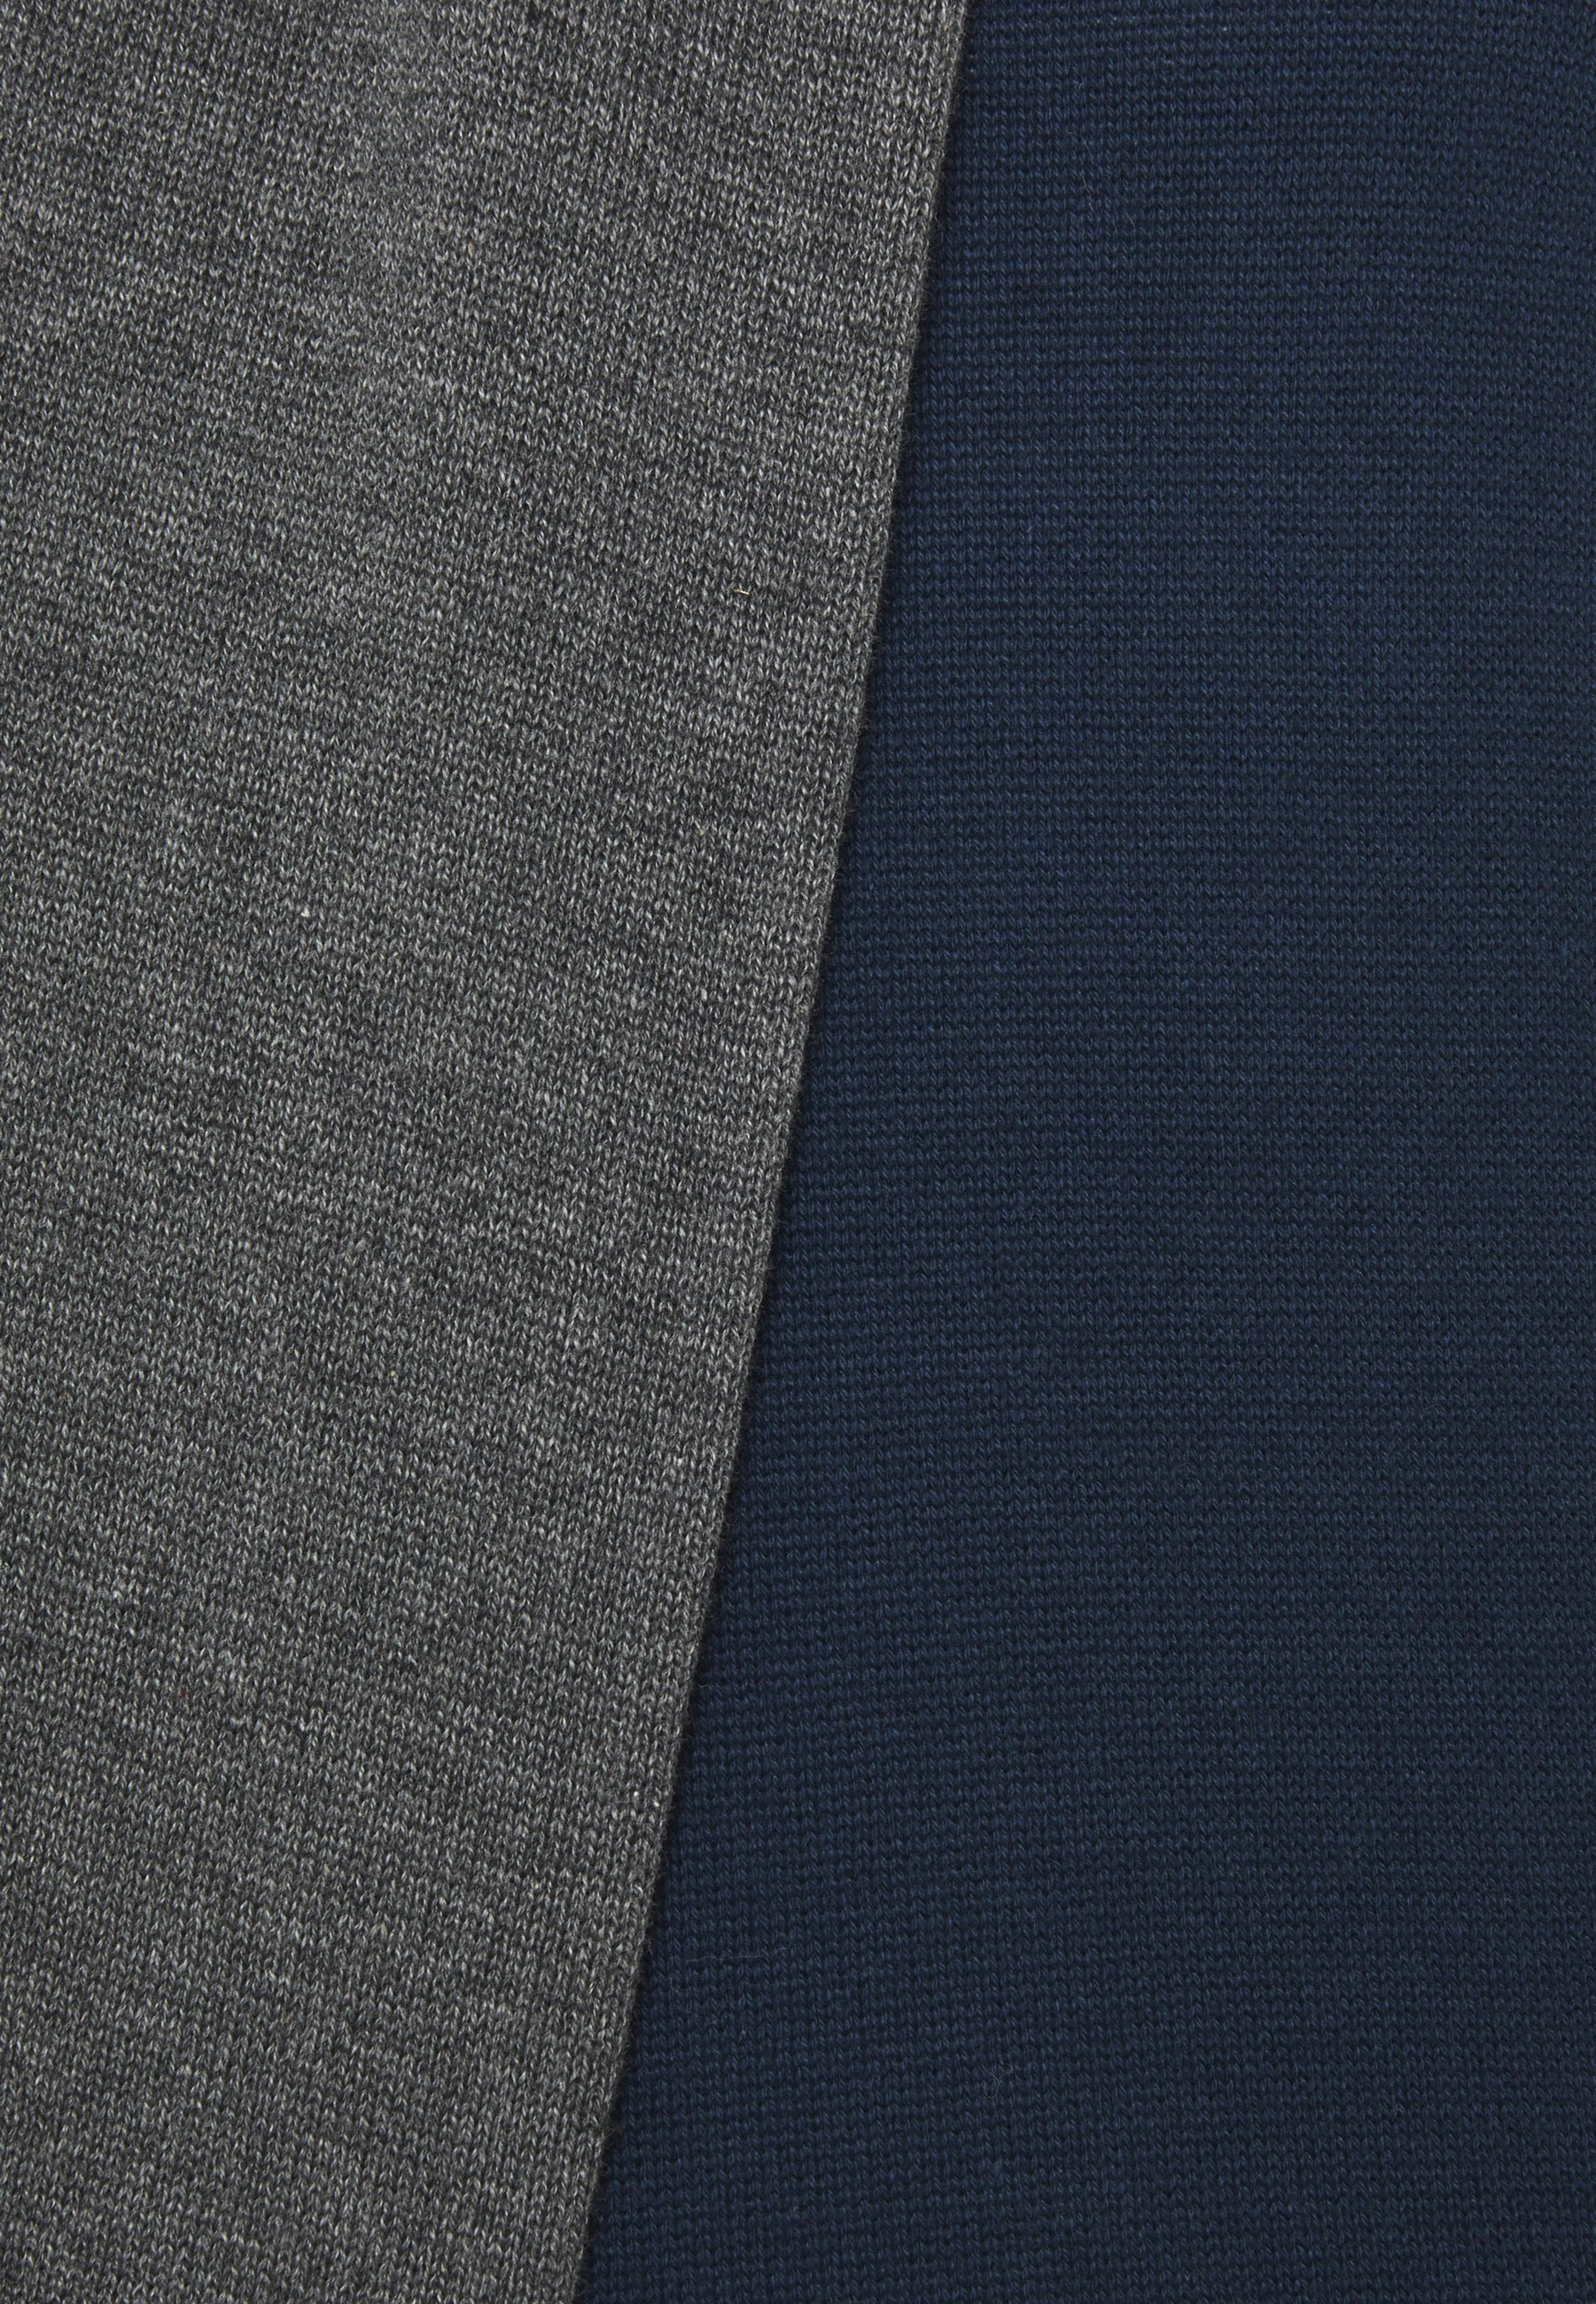 Factory Price New Arrival Fashion Men's Clothing Pier One 2 PACK  Jumper dark blue/mottled dark grey LloAzZZ7i SFM3hP6D9